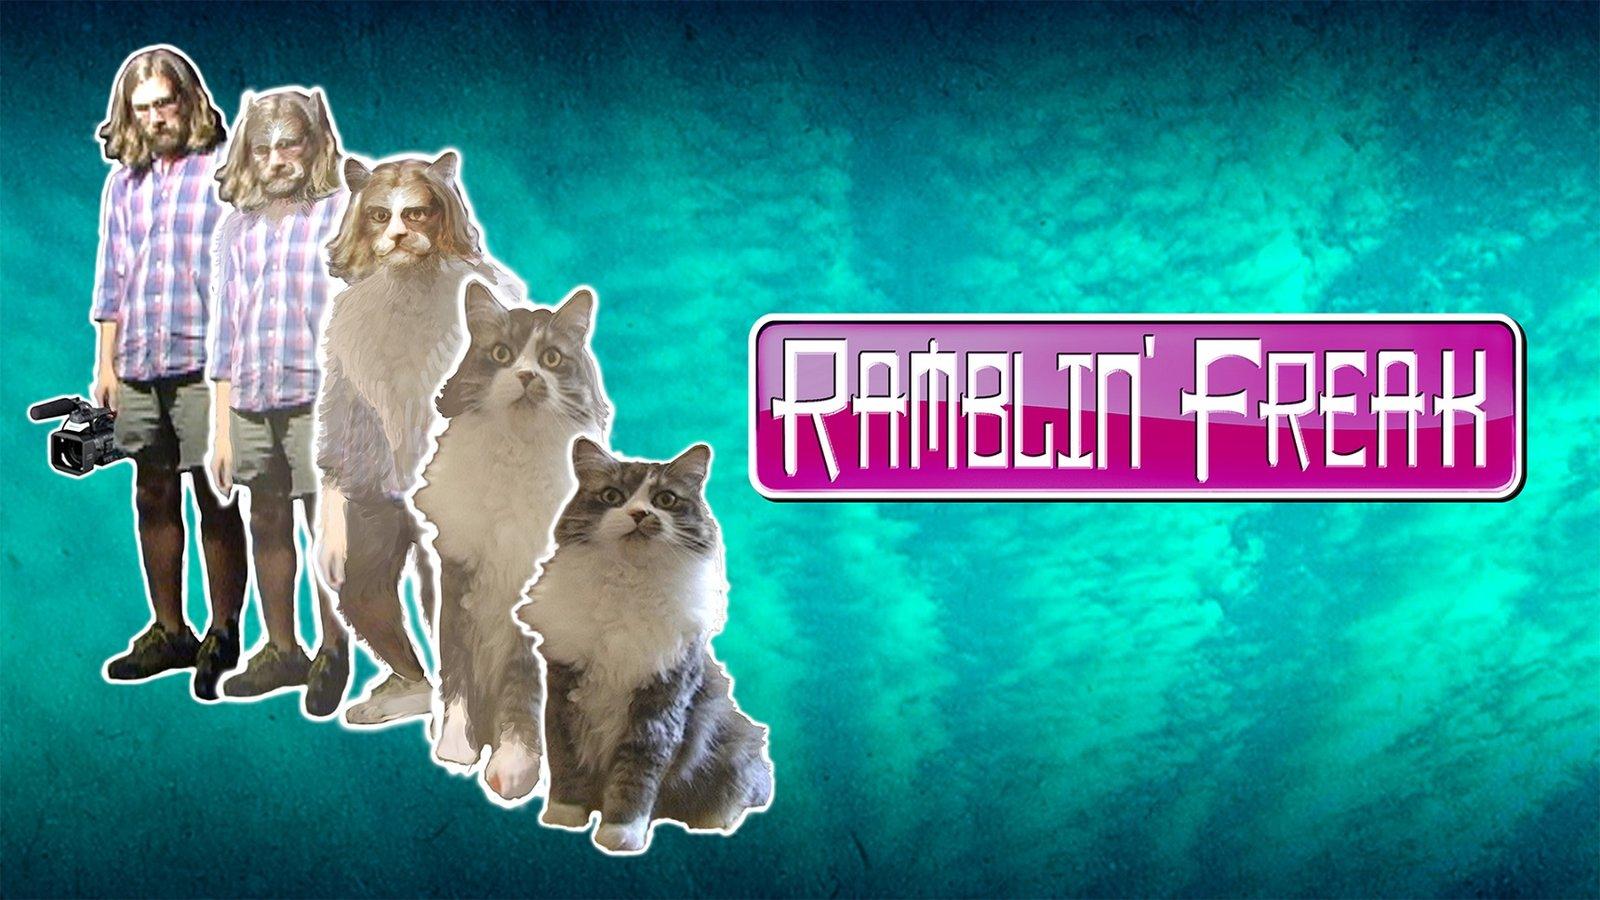 Ramblin' Freak - A Cinematic Road Trip